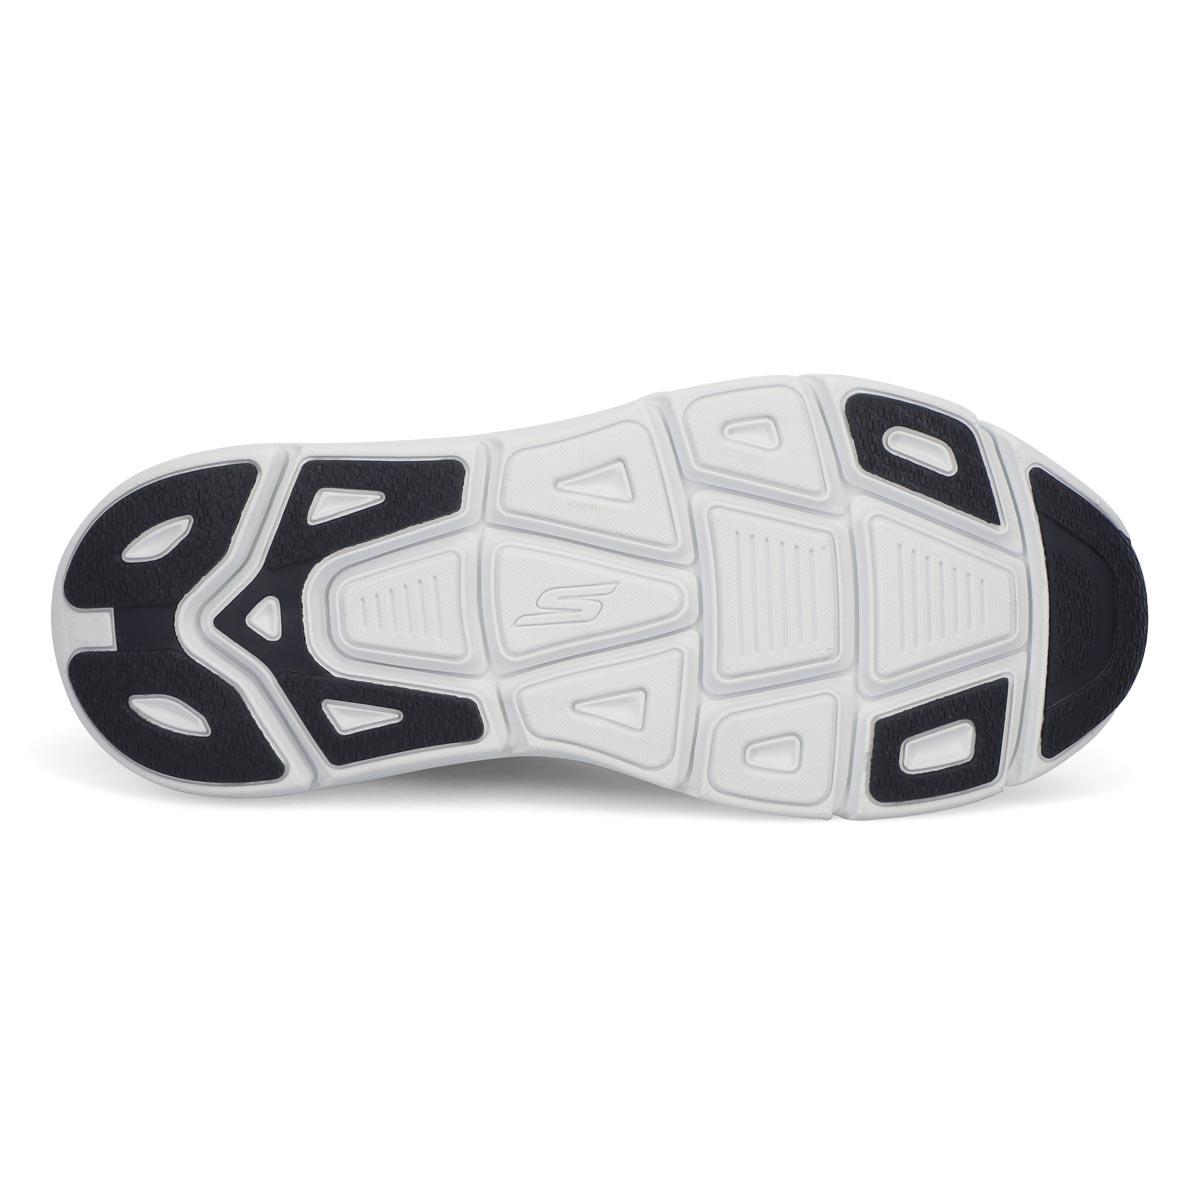 Men's Max Cushion Premier Vantage Sneaker - Navy